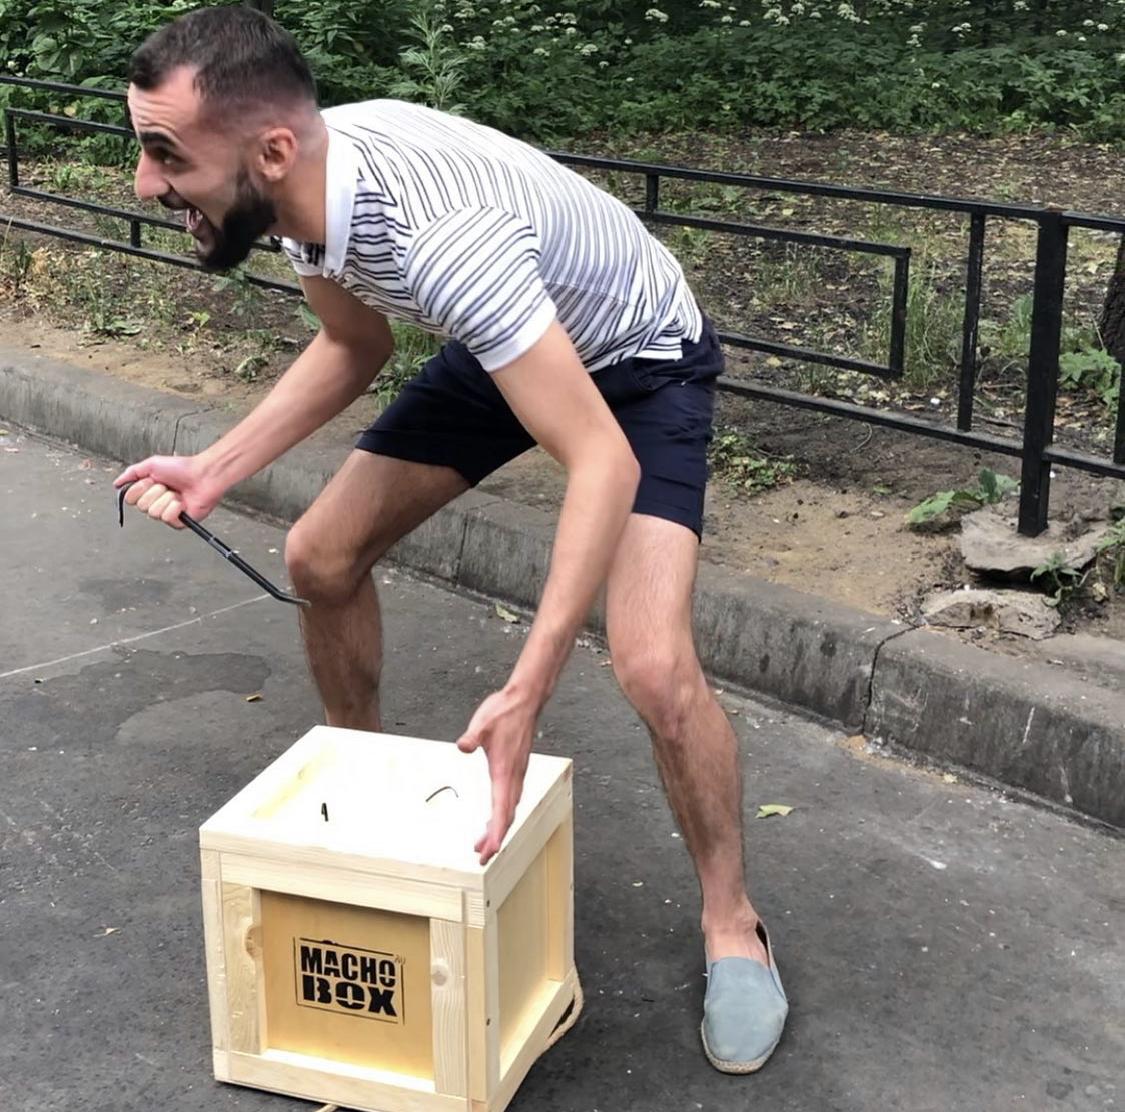 купить подарок мужчине онлайн